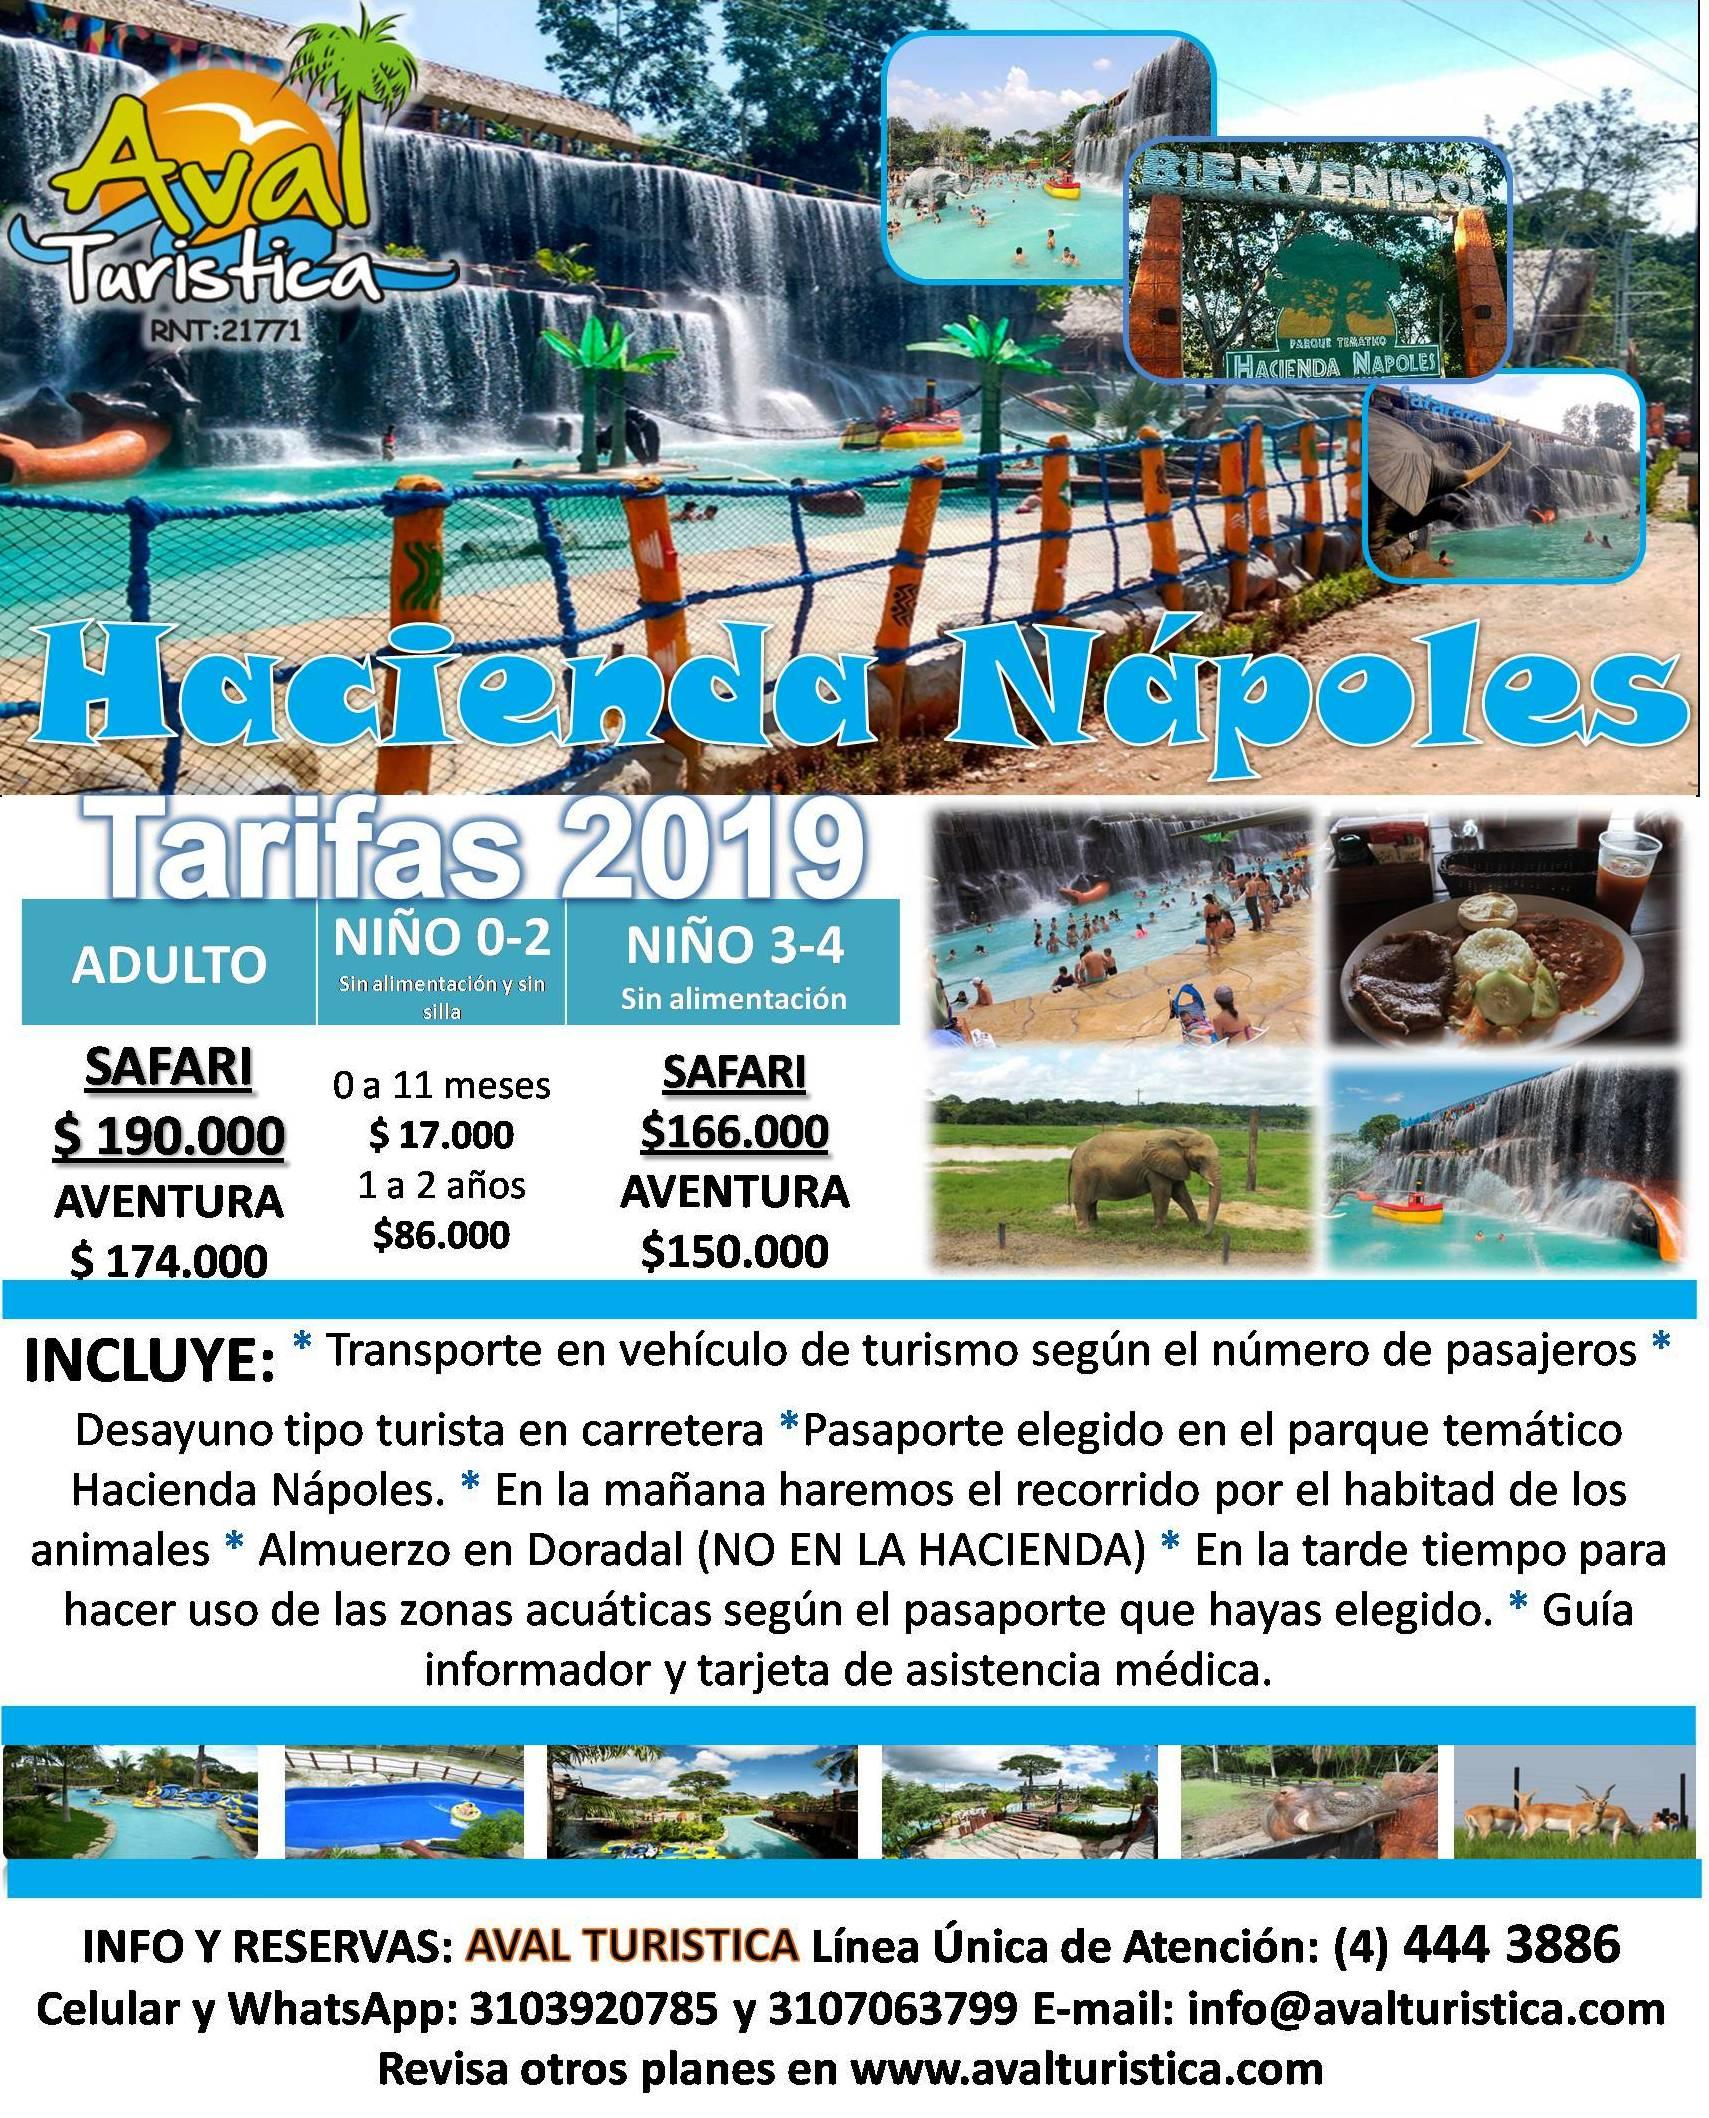 Plan Da de Sol Hacienda Npoles 2019